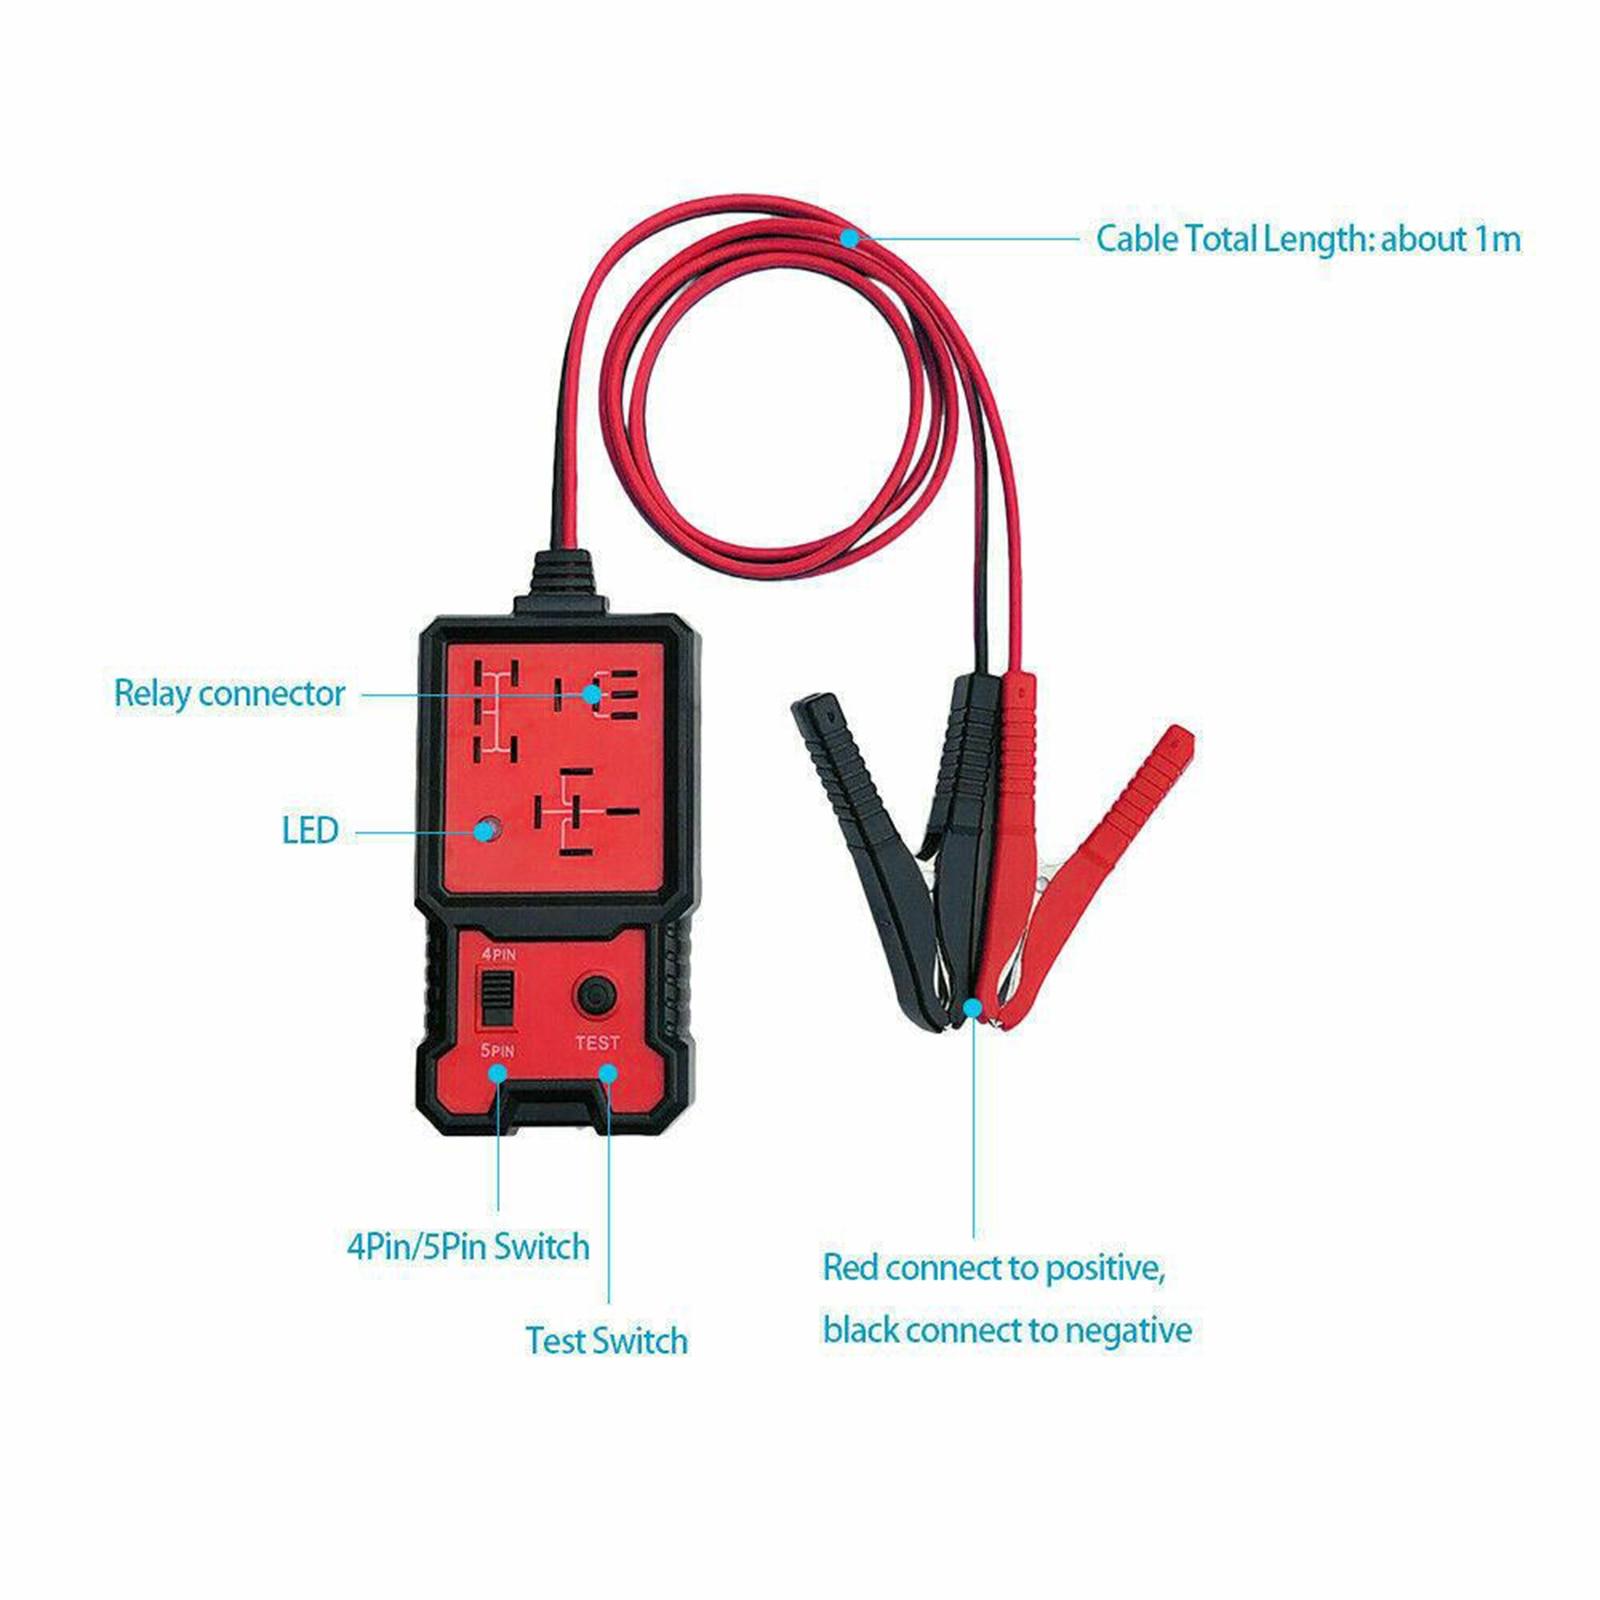 12V Plastic Electronic Automotive Relay Tester for Cars Auto Automotive Kit